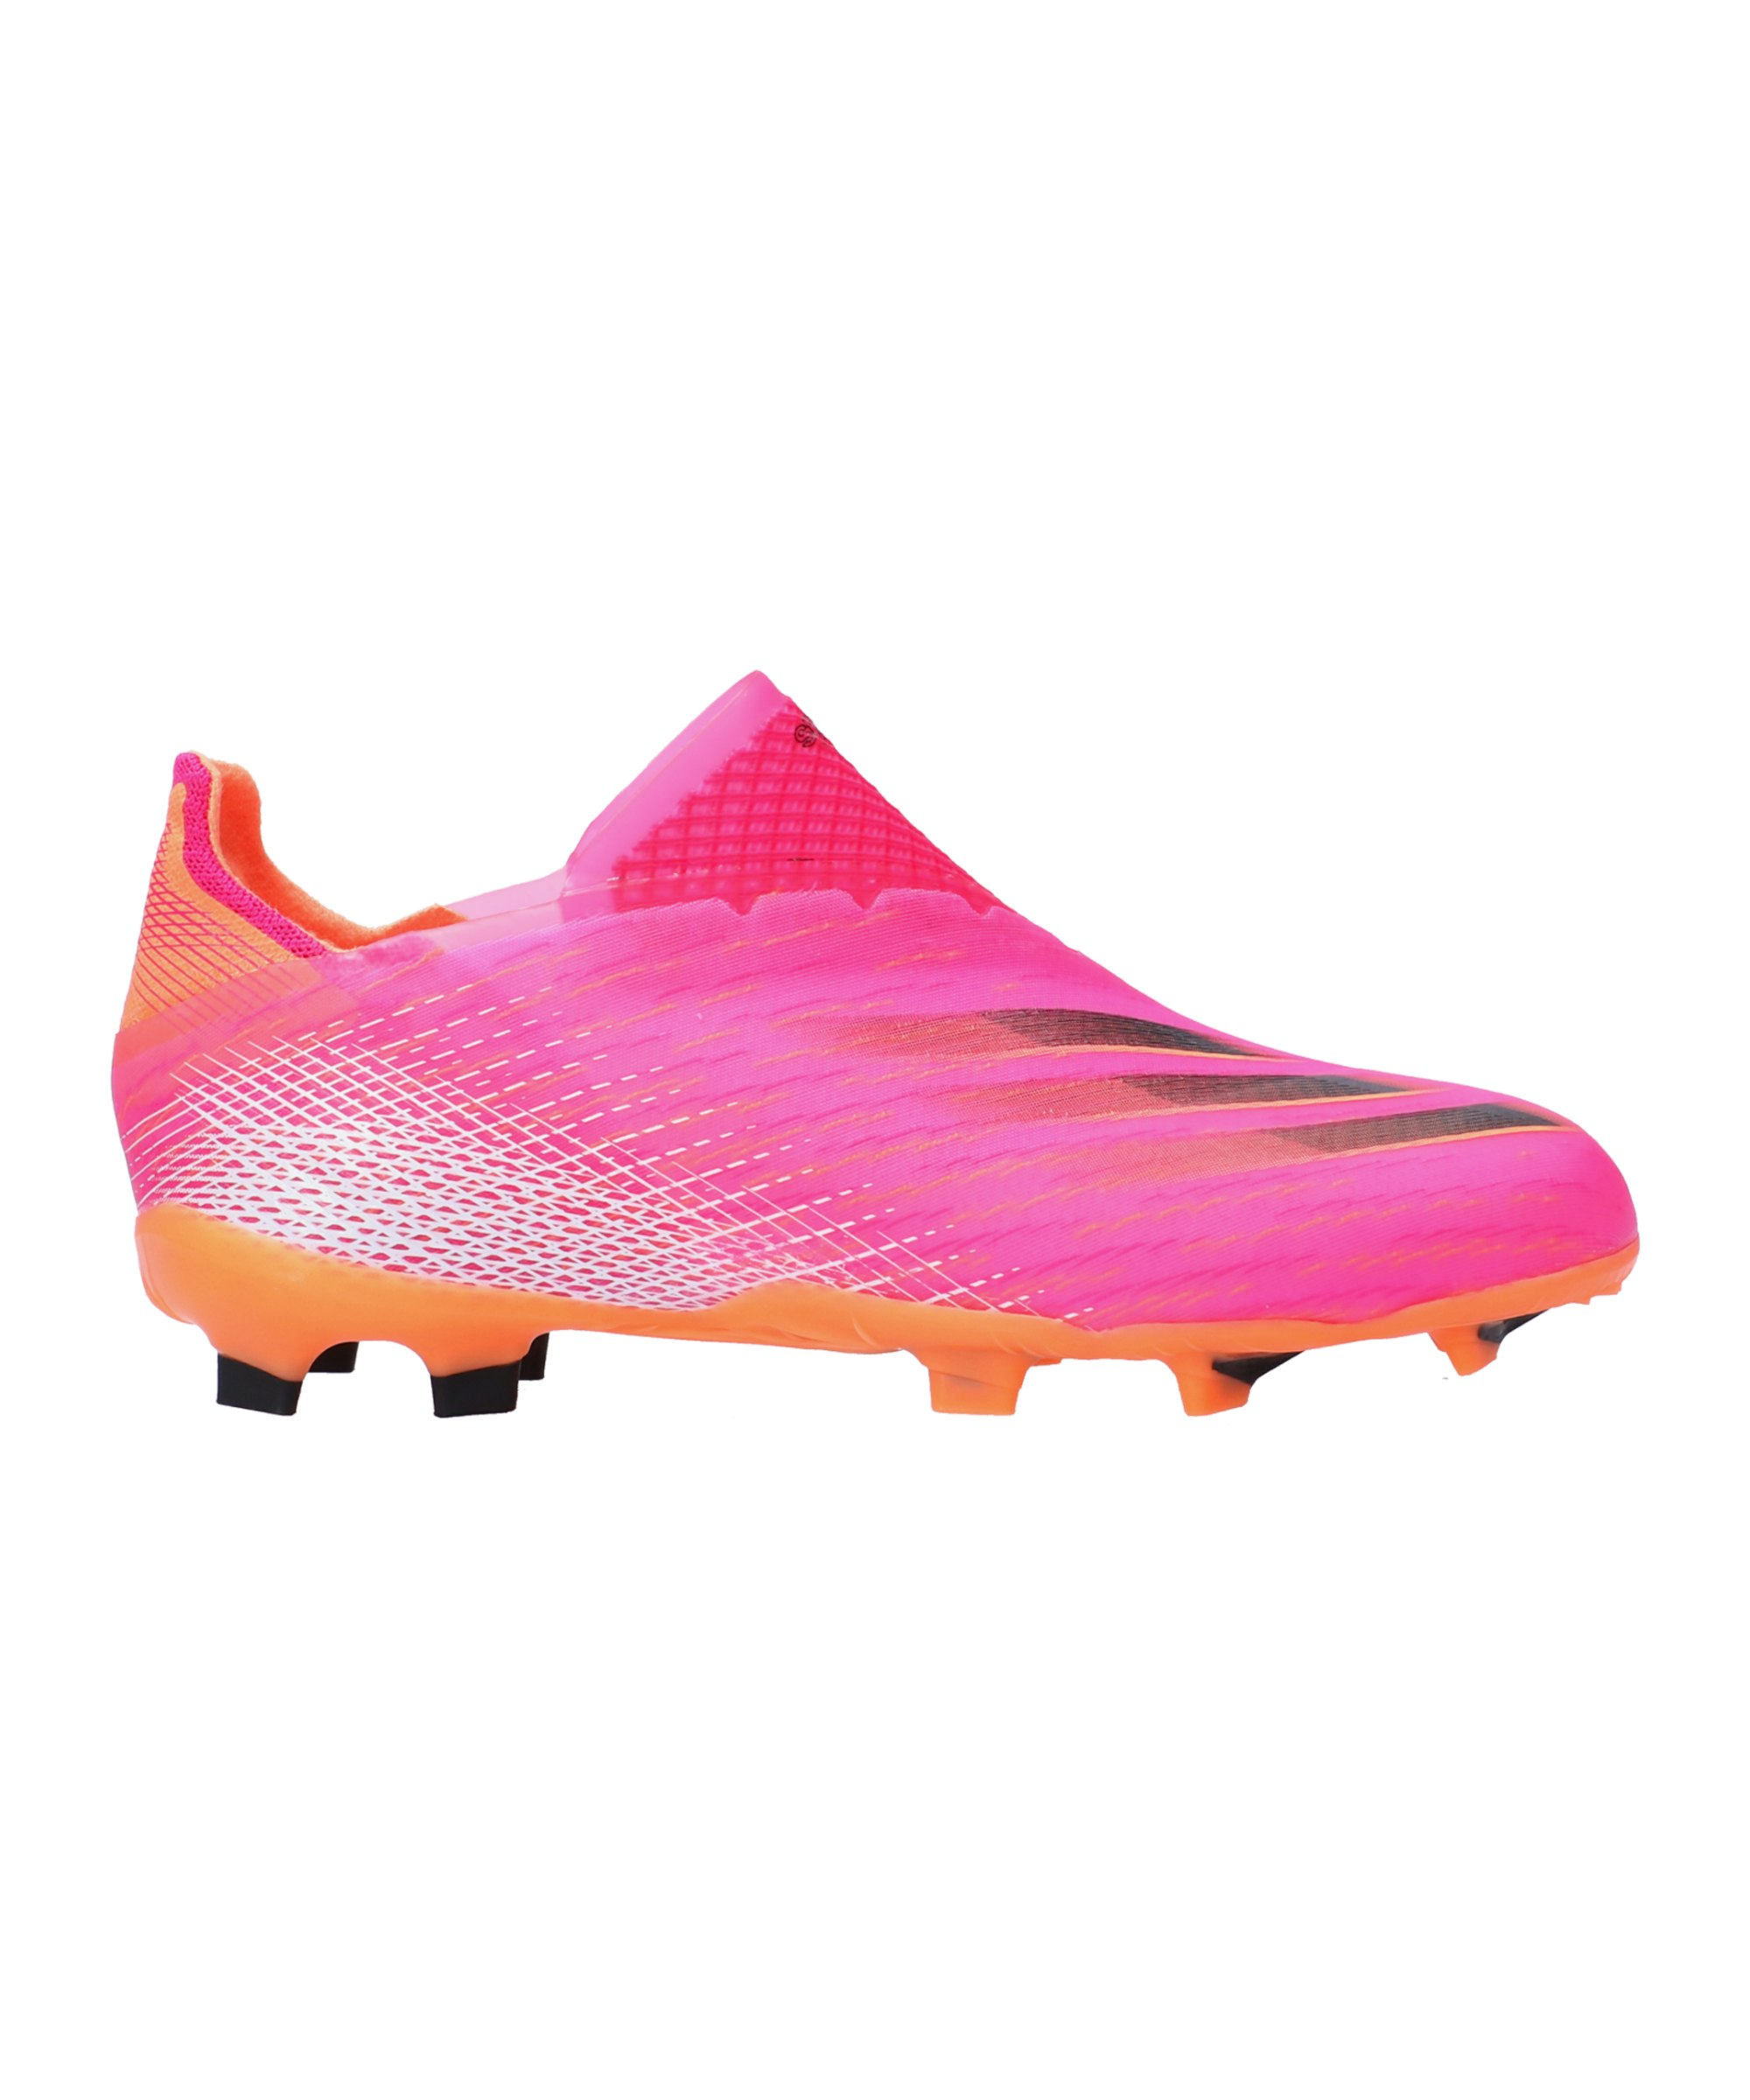 adidas X GHOSTED+ FG Superspectral J Kids Pink Schwarz Orange - pink